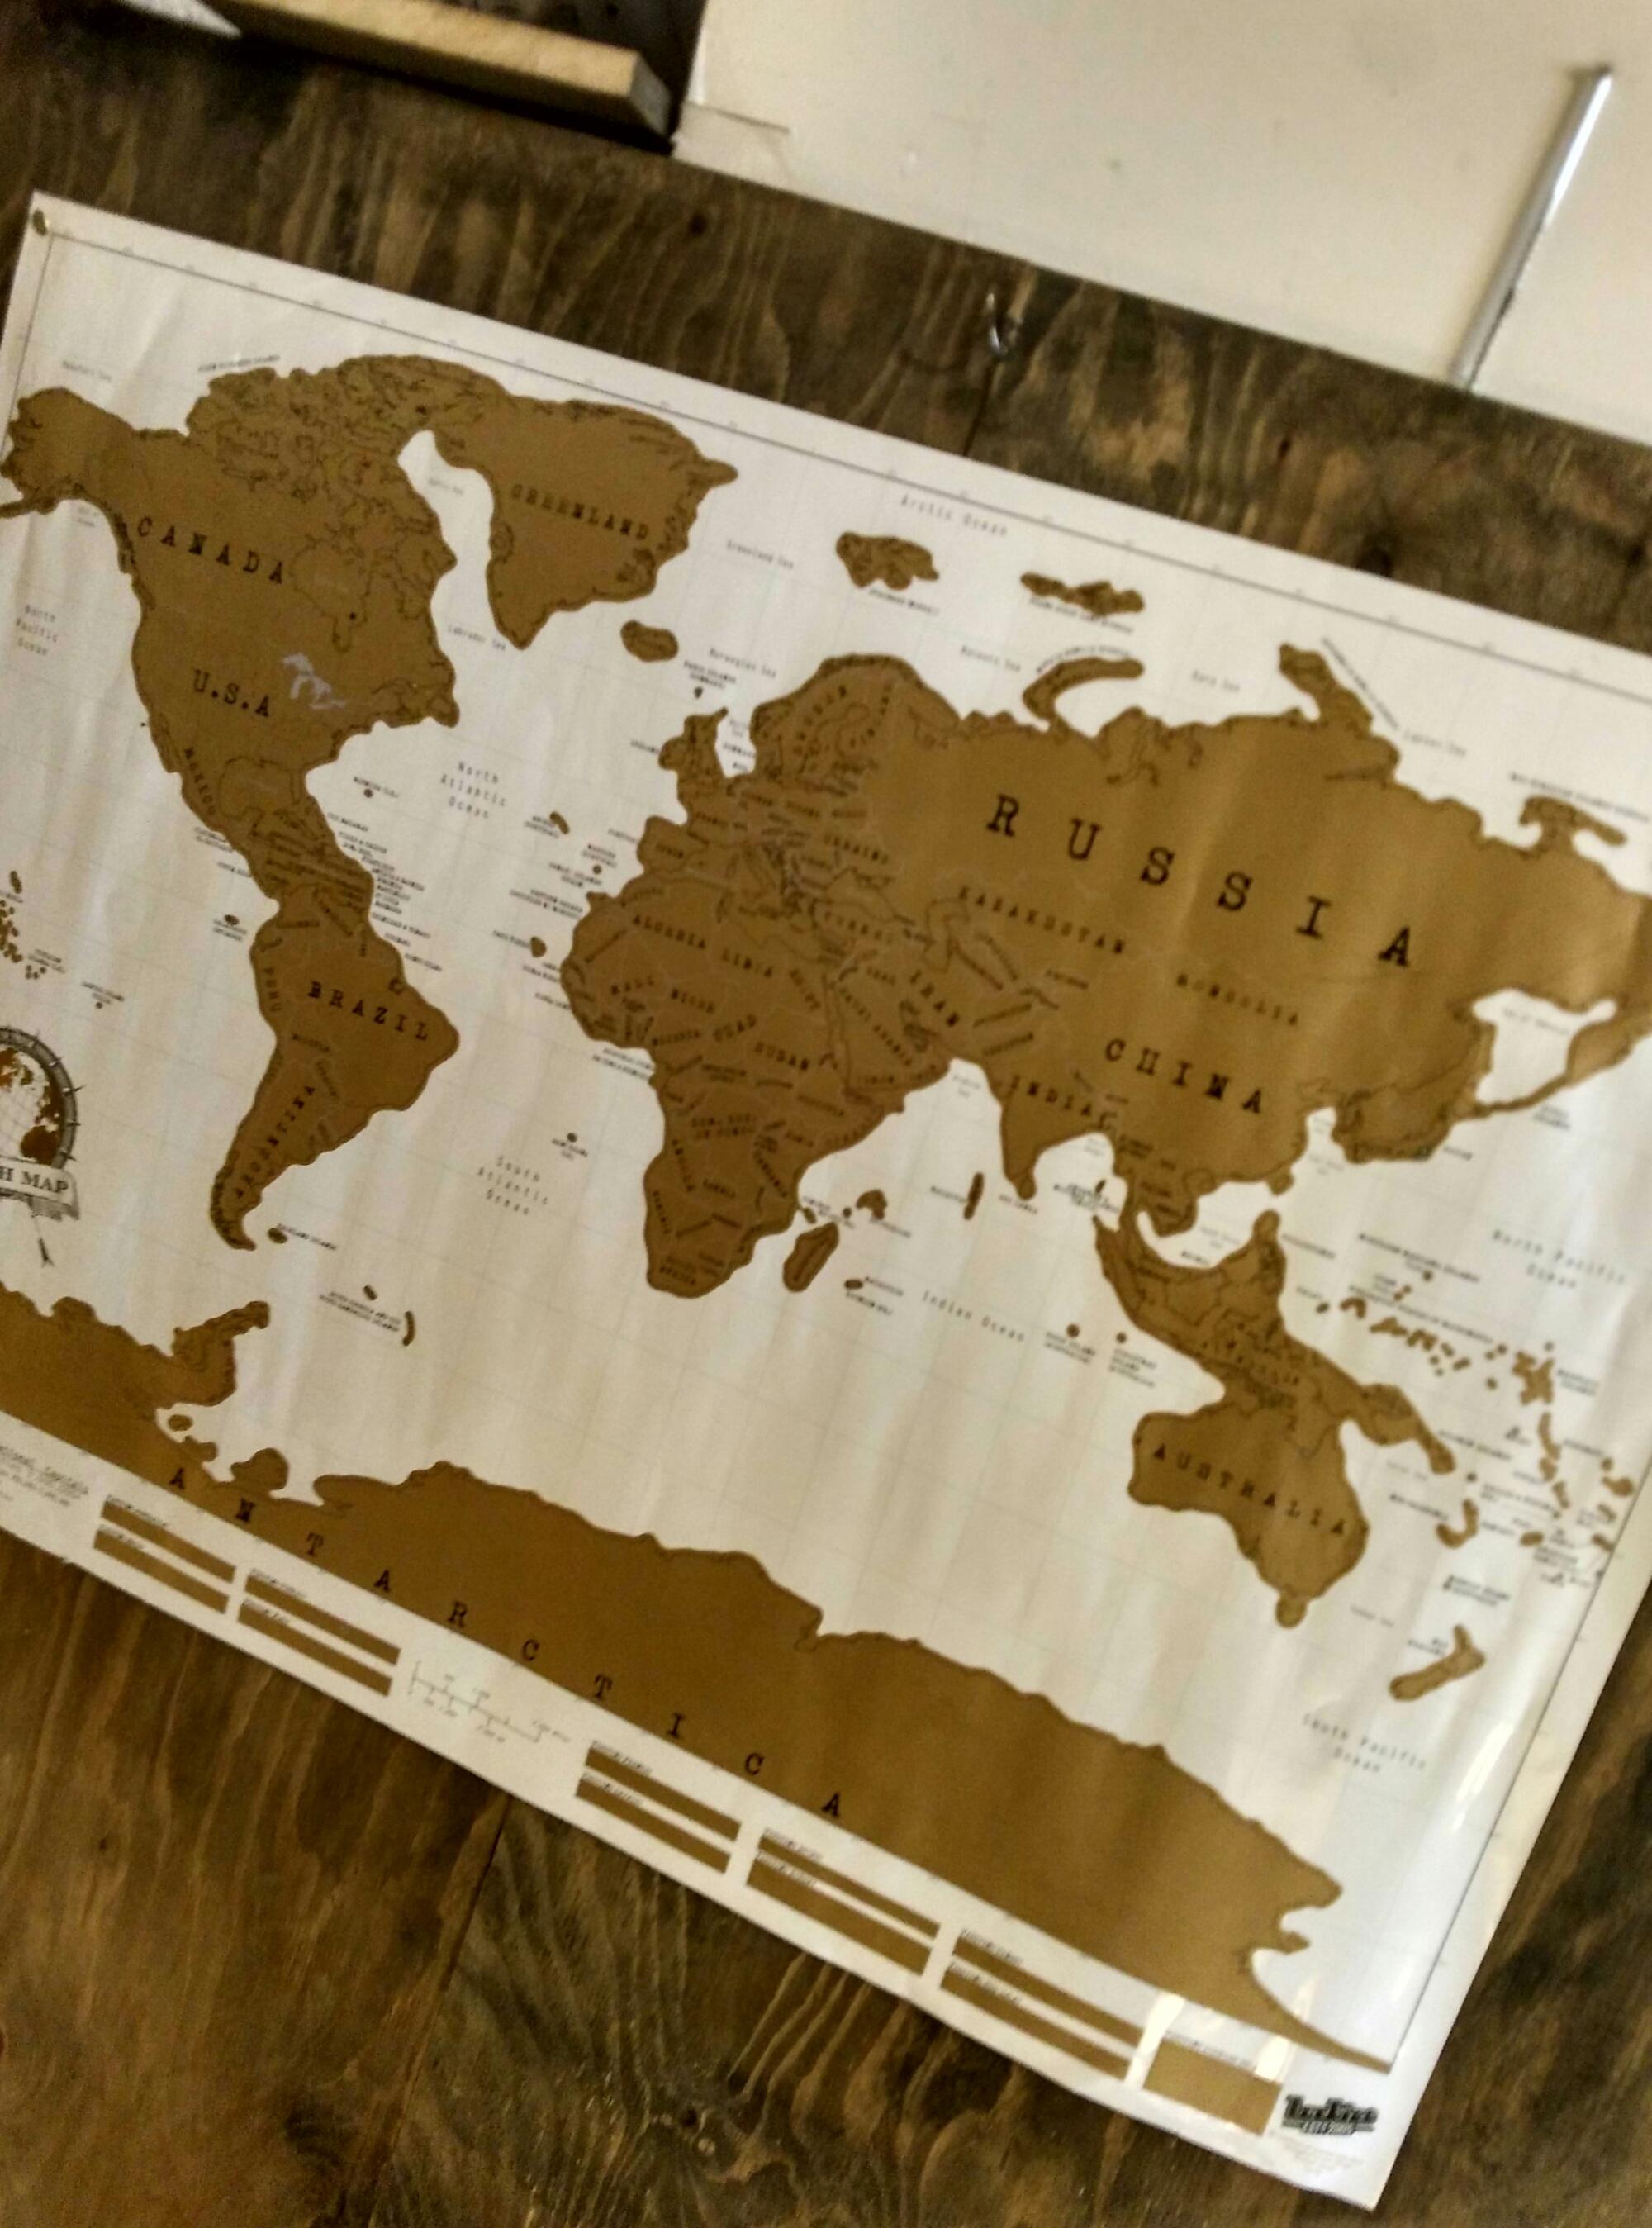 googleリアルタイム翻訳は旅で使える